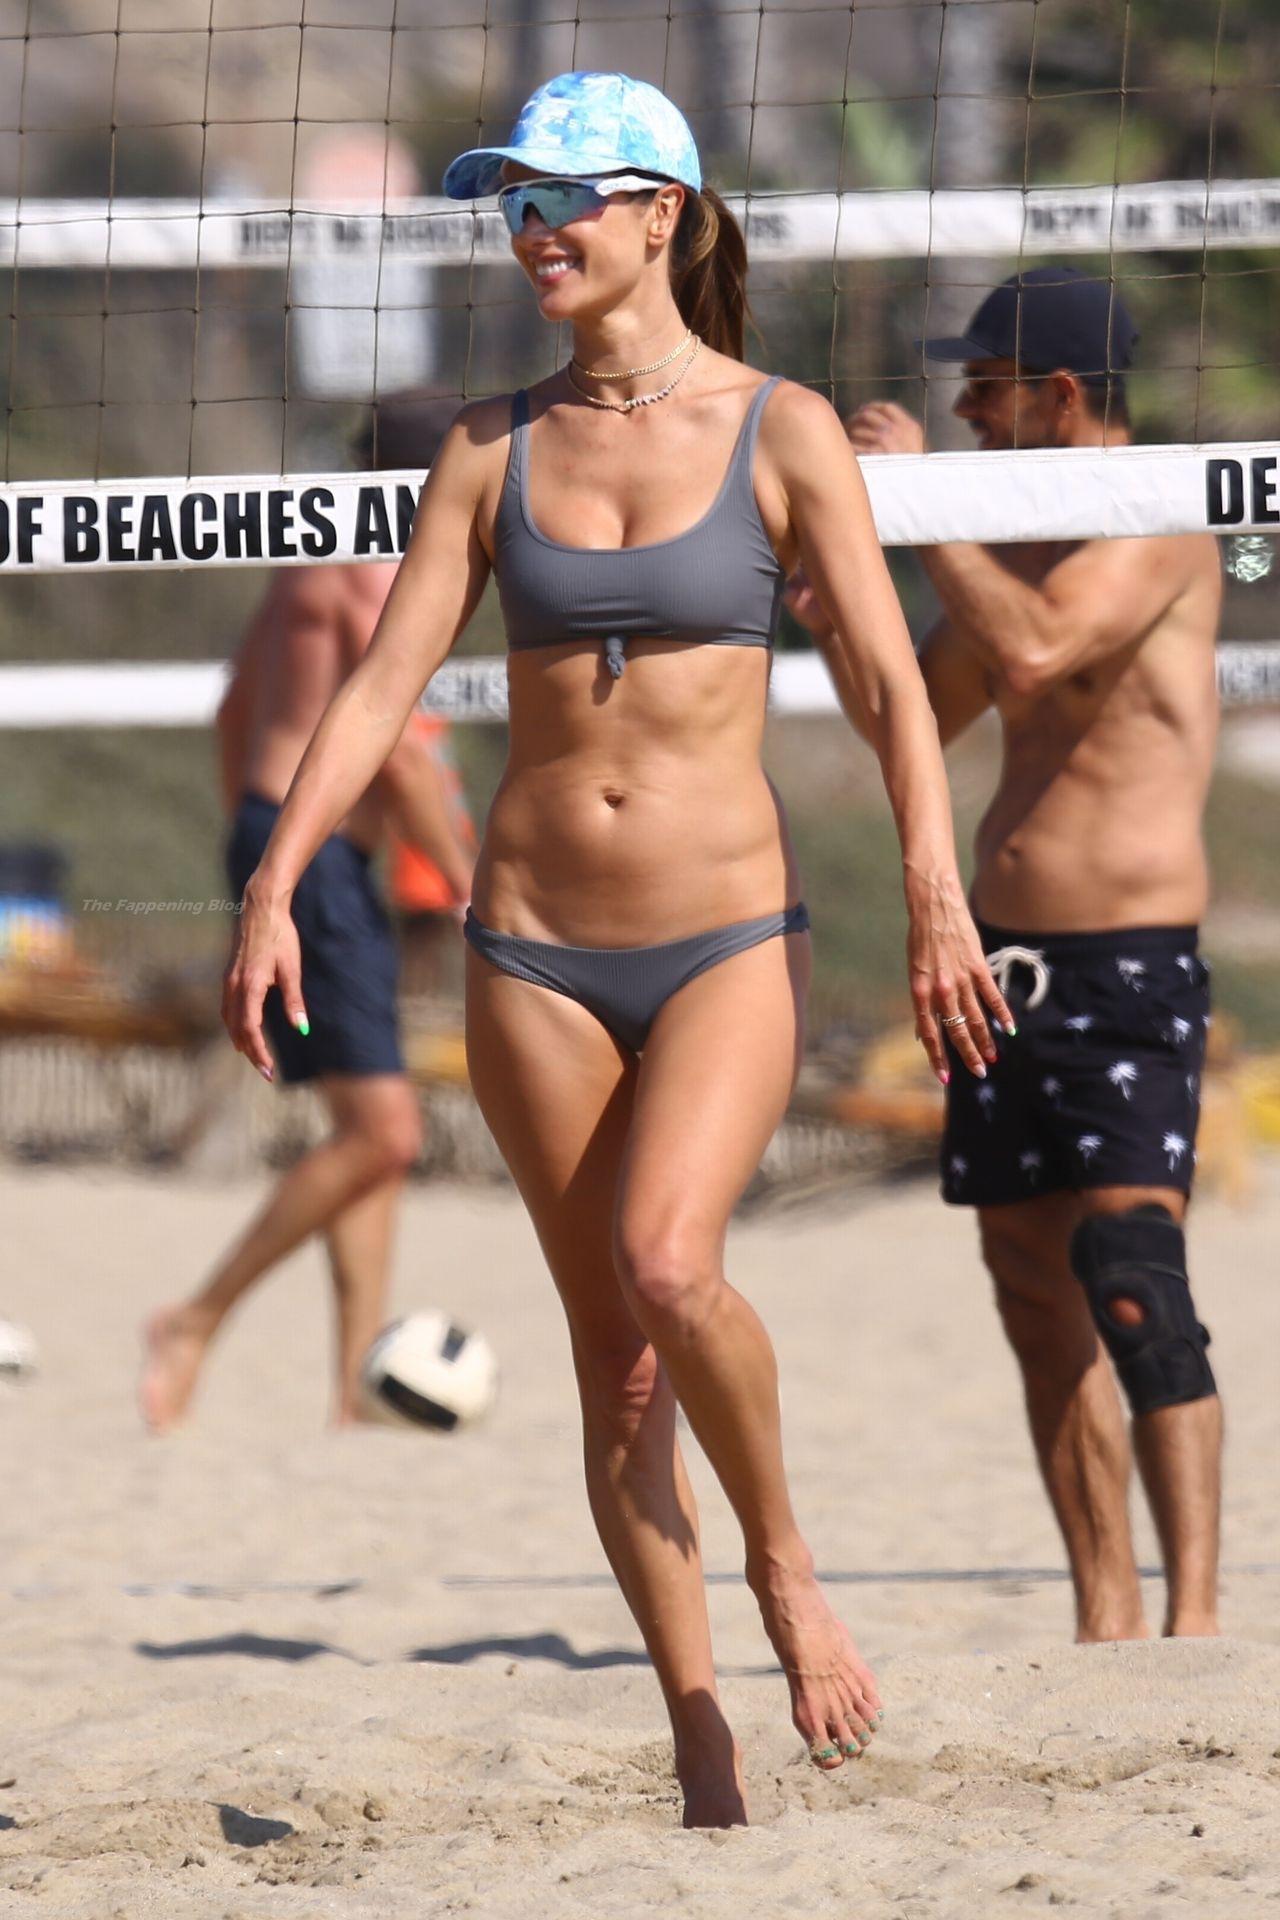 Alessandra-Ambrosio-Sexy-The-Fappening-Blog-19-3.jpg